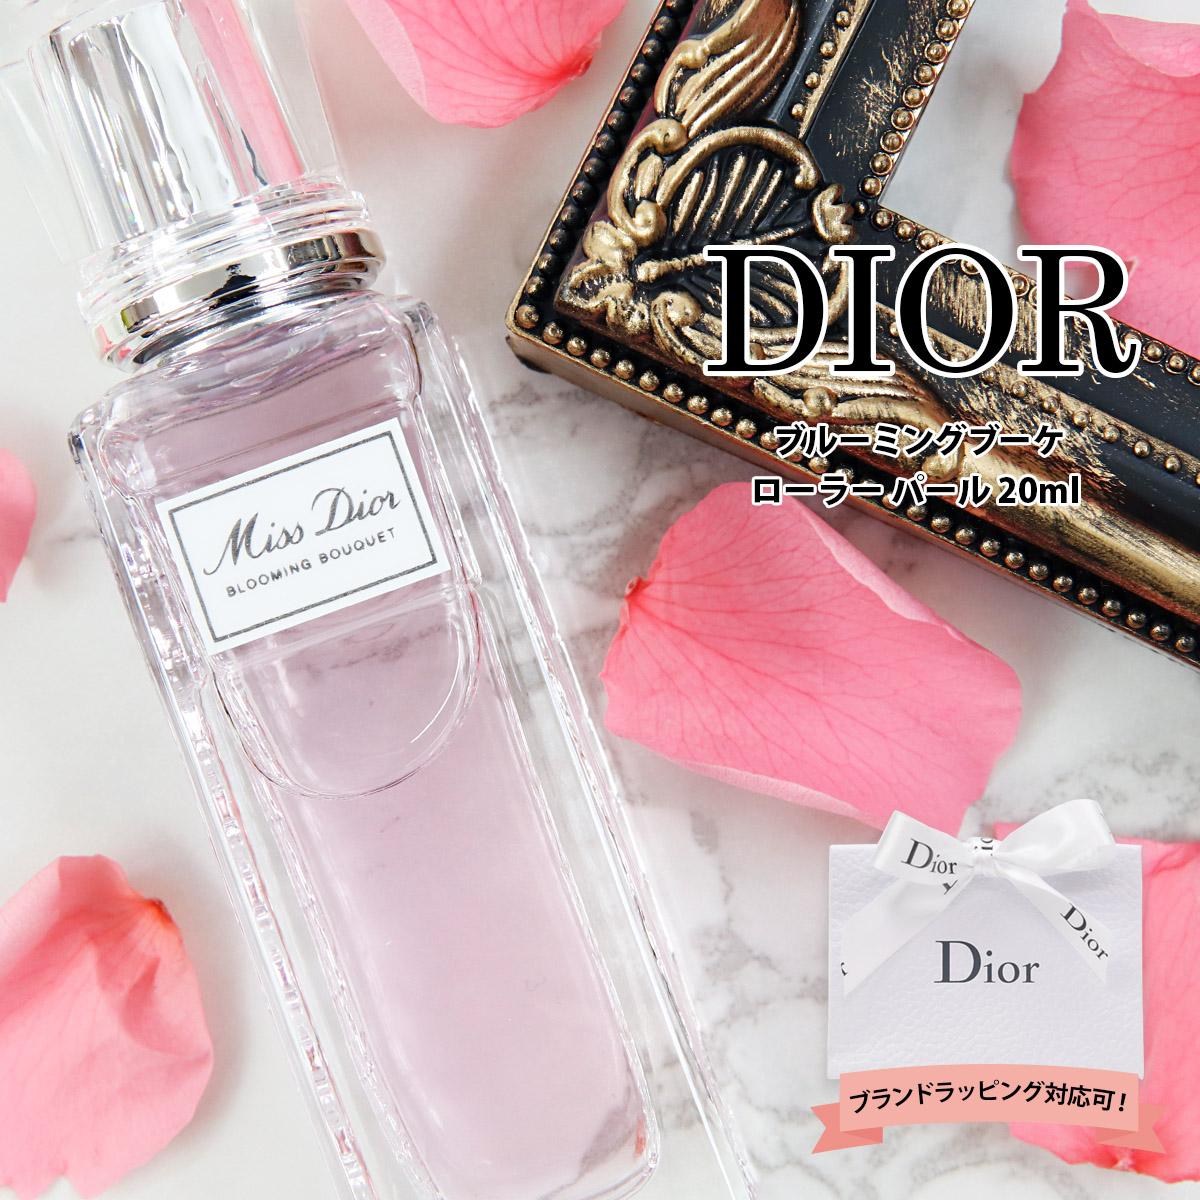 quality design fca2a 2f4e1 名入れ クリスチャンディオール Christian Dior 香水 フレグランス ミス ディオール ブルーミング ブーケ ローラー パール 20ml  ロールオン 正規品 セールブランド 新品 新作 2019年 ギフト|ワールドギフト カヴァティーナ